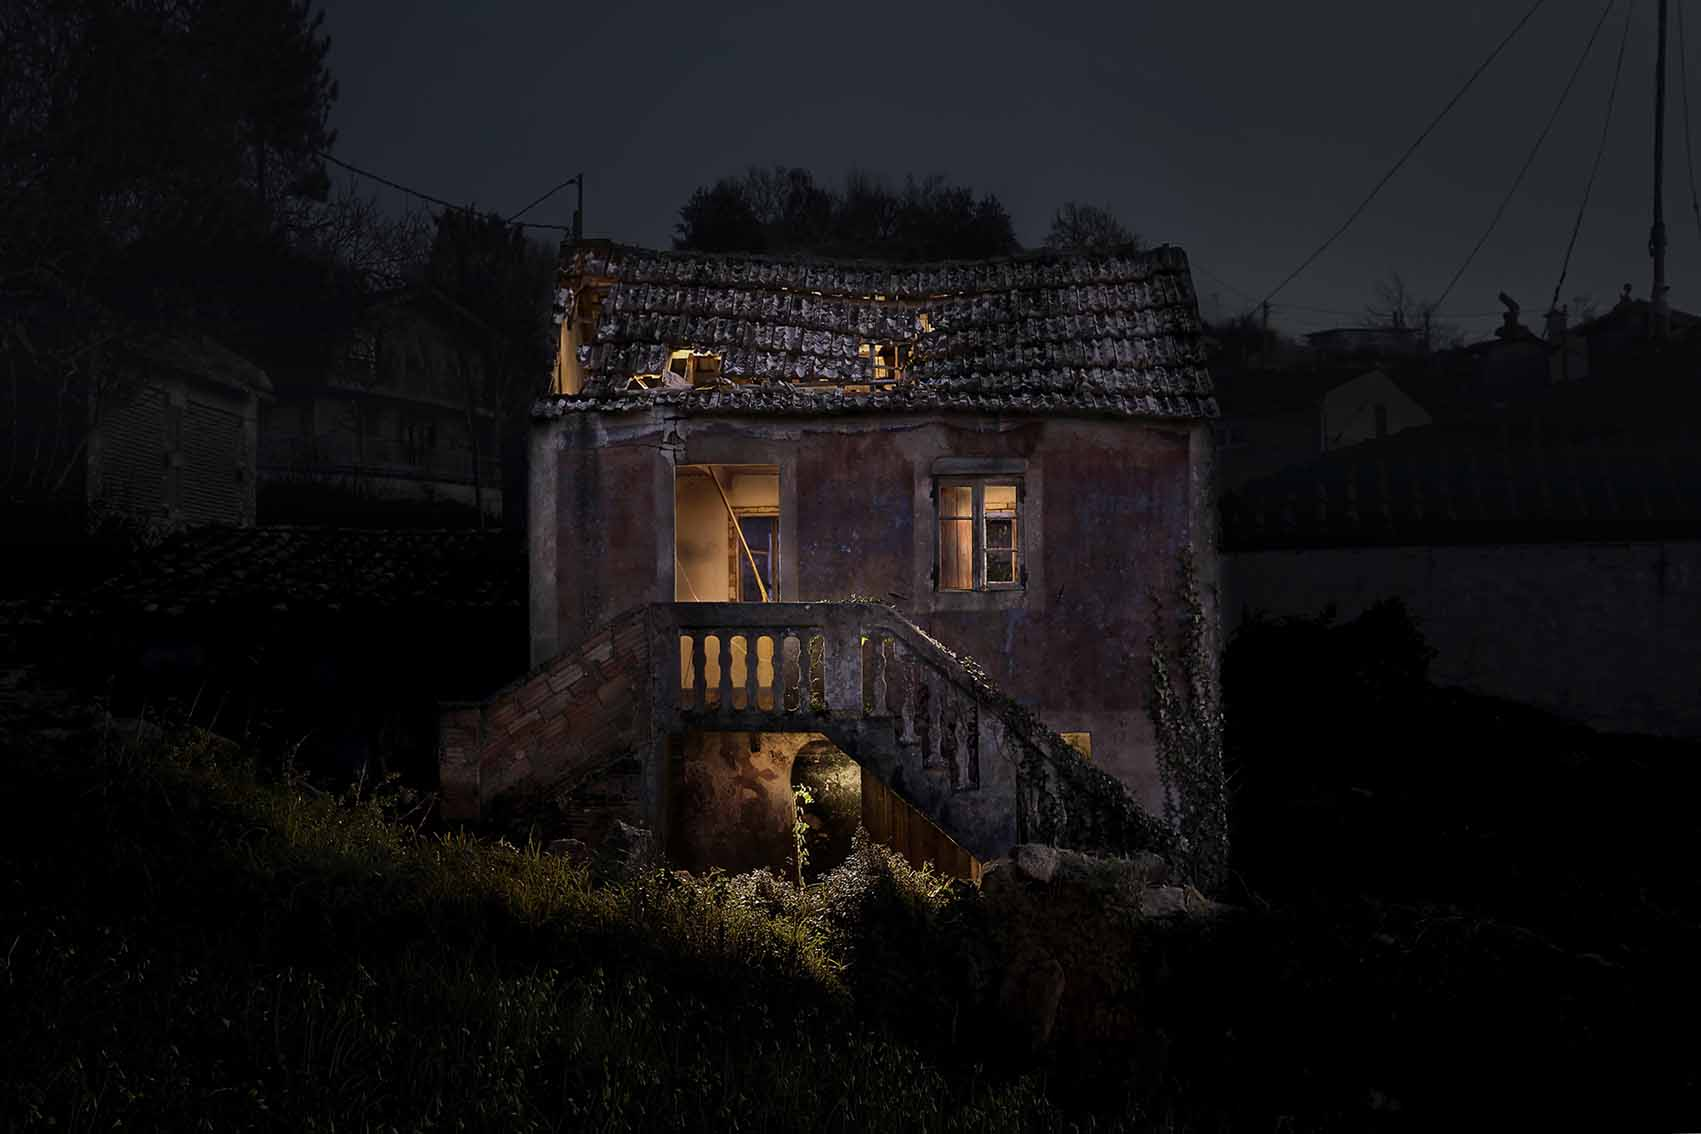 Art Photo Bcn: primavera fotográfica en Barcelona Artes & contextos Eva Diez